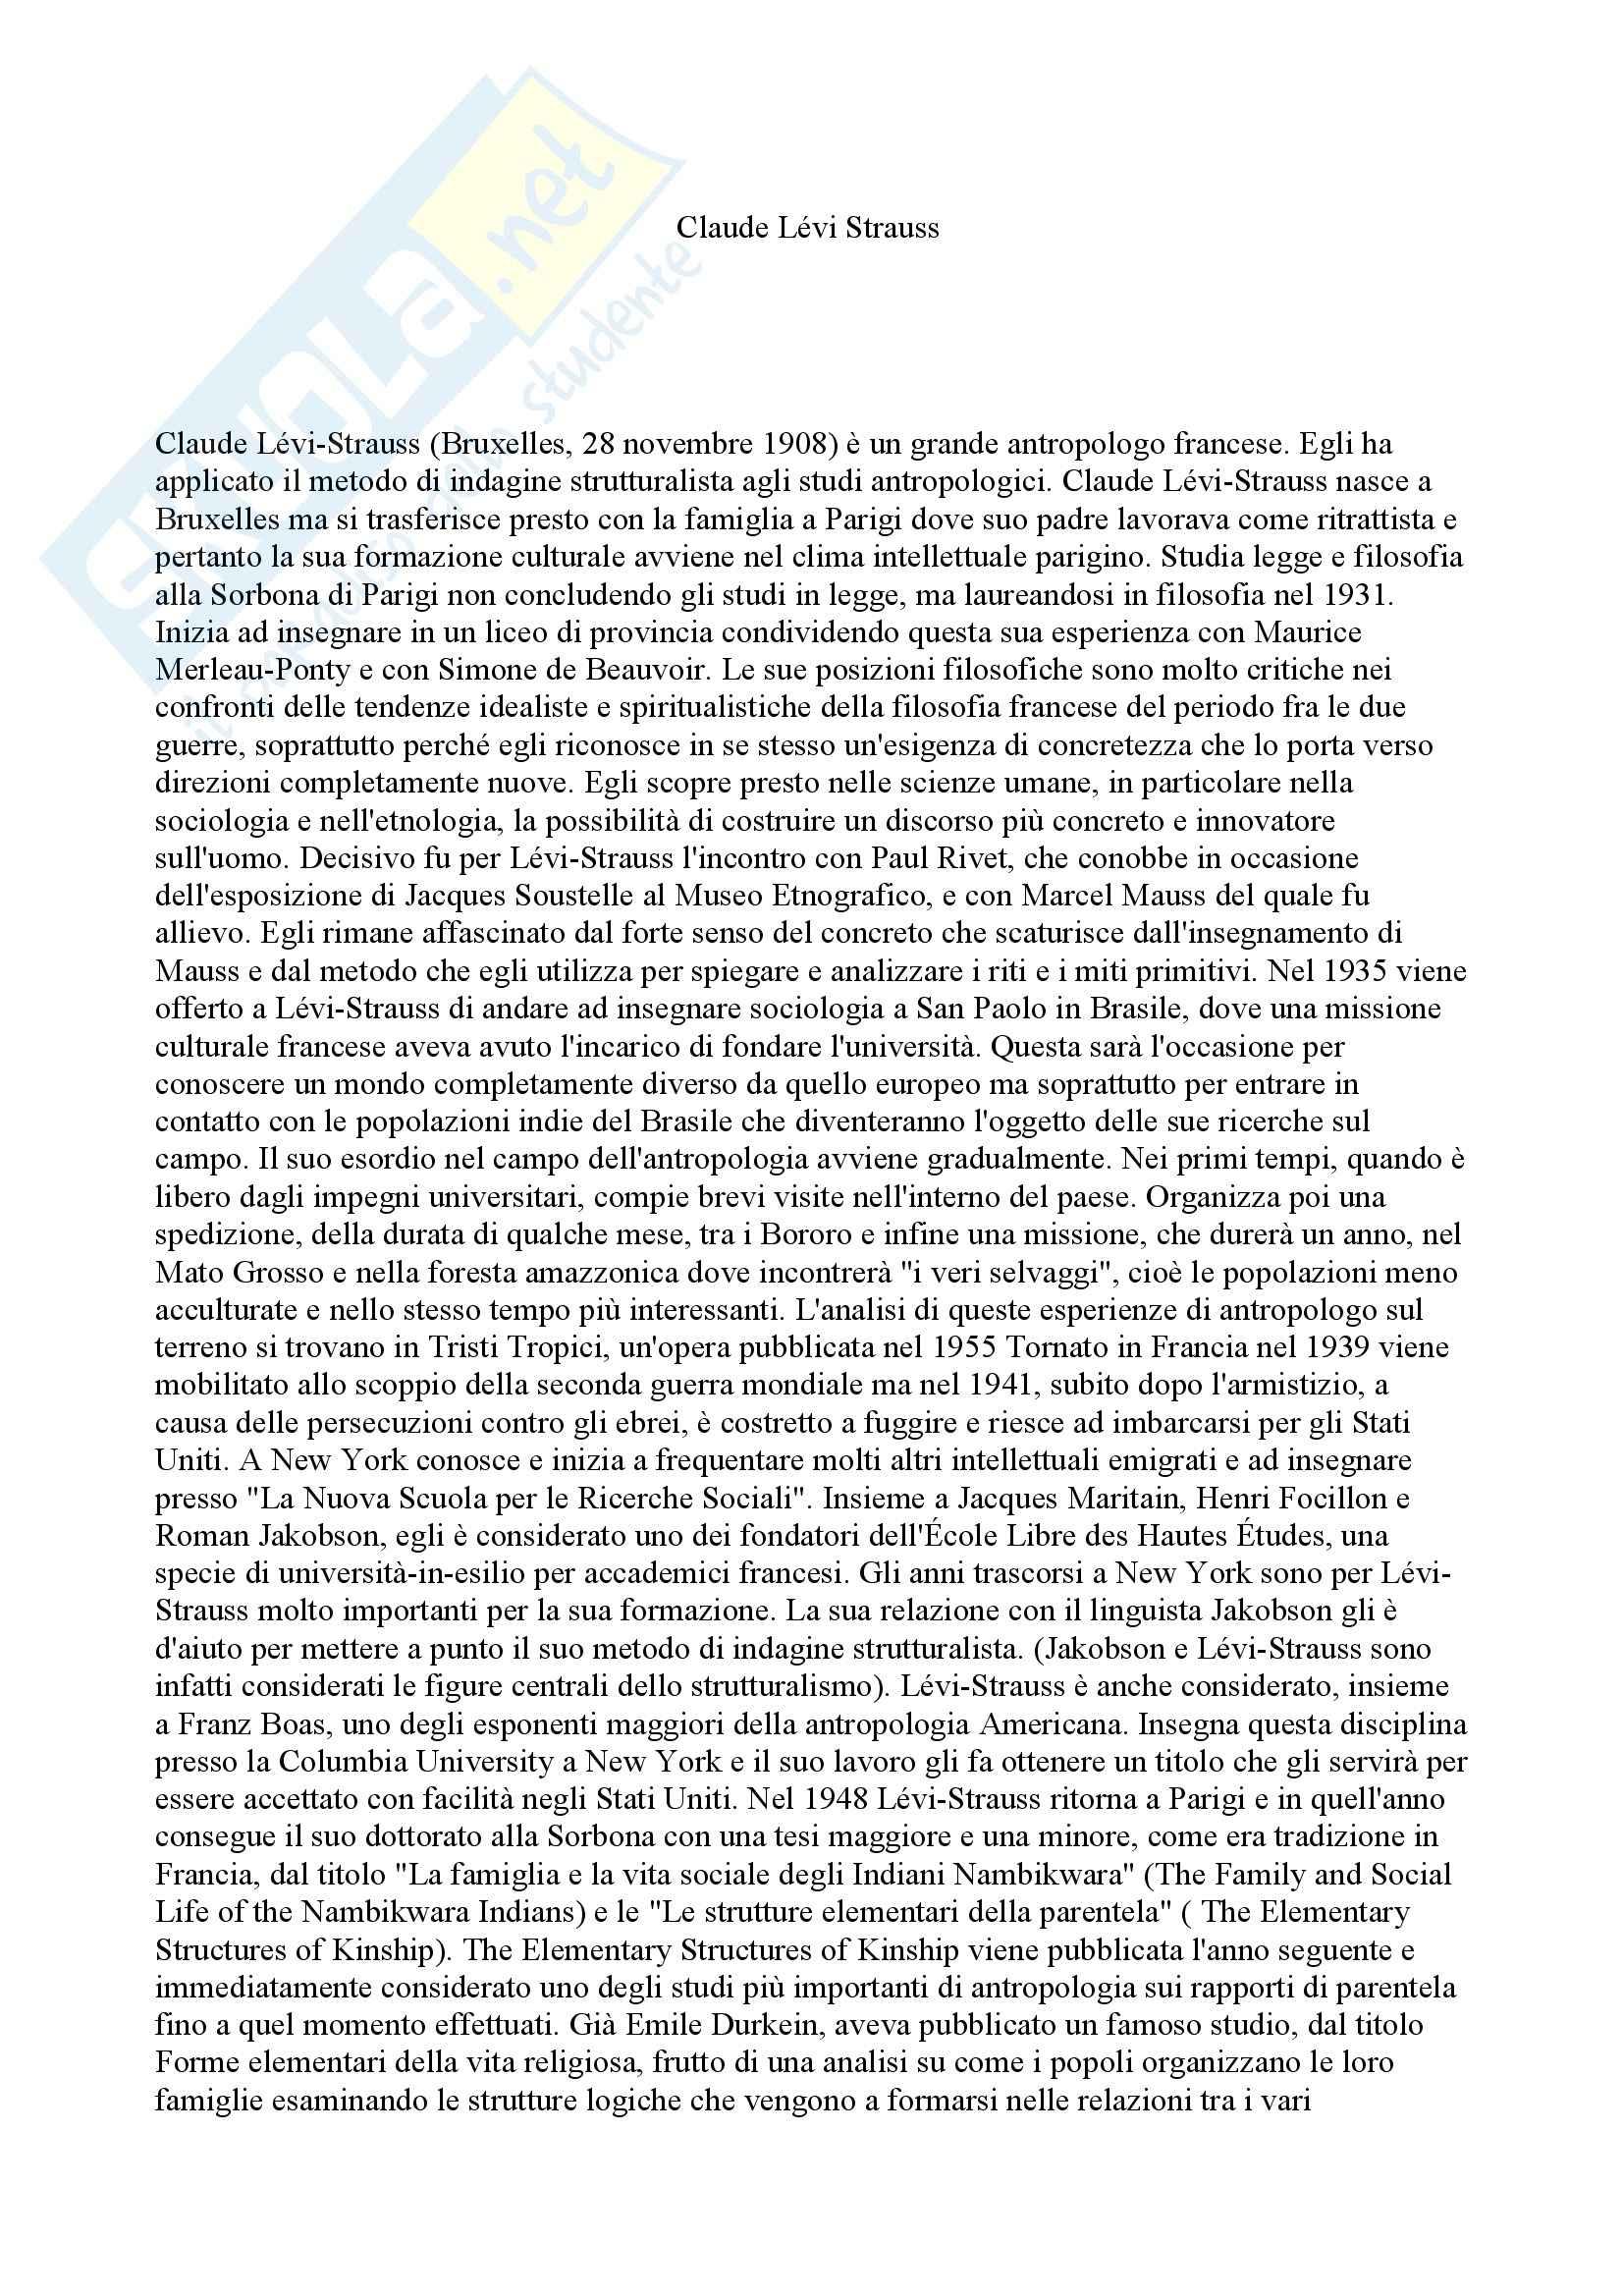 Antropologia culturale - Levi-Strauss - appunti